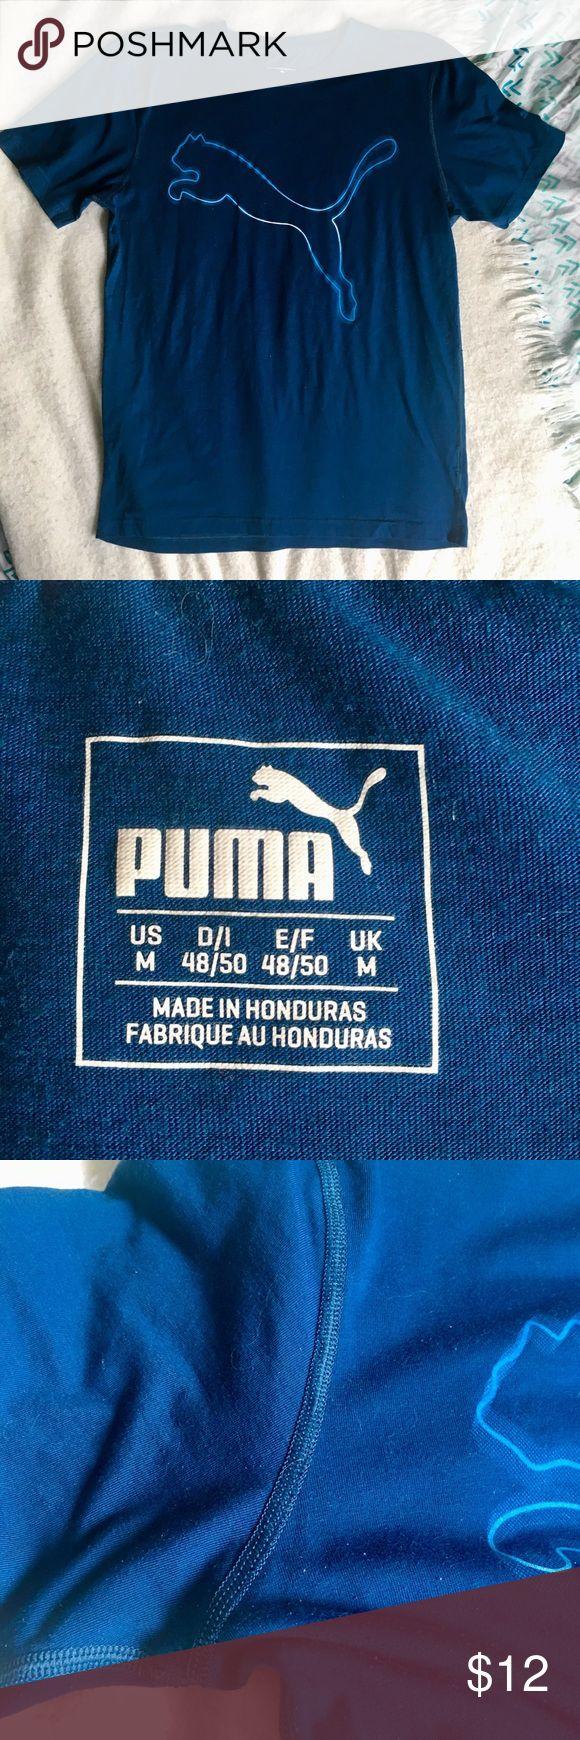 PUMA T-Shirt! Blue PUMA t-Shirt, in excellent condition. Size medium. Puma Shirts Tees - Short Sleeve